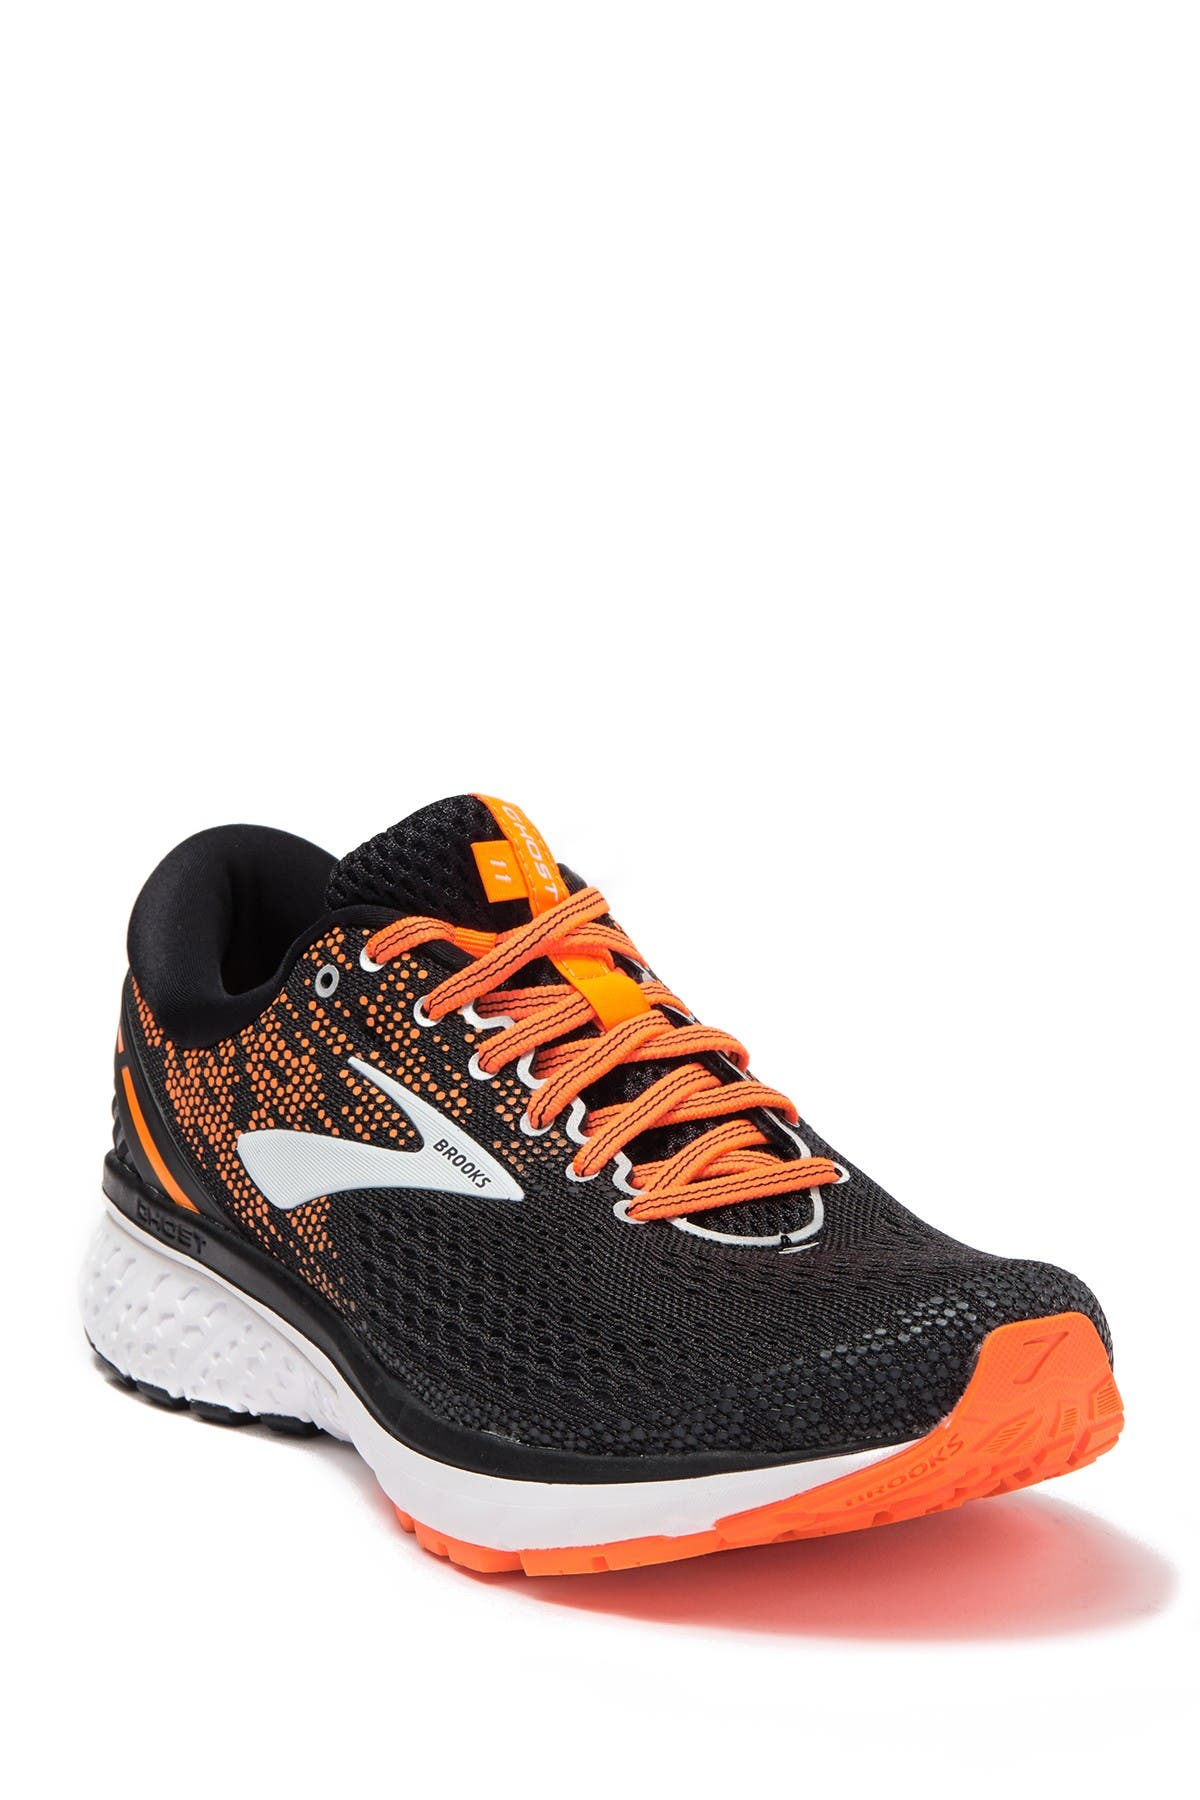 Brooks | Ghost 11 Running Shoe